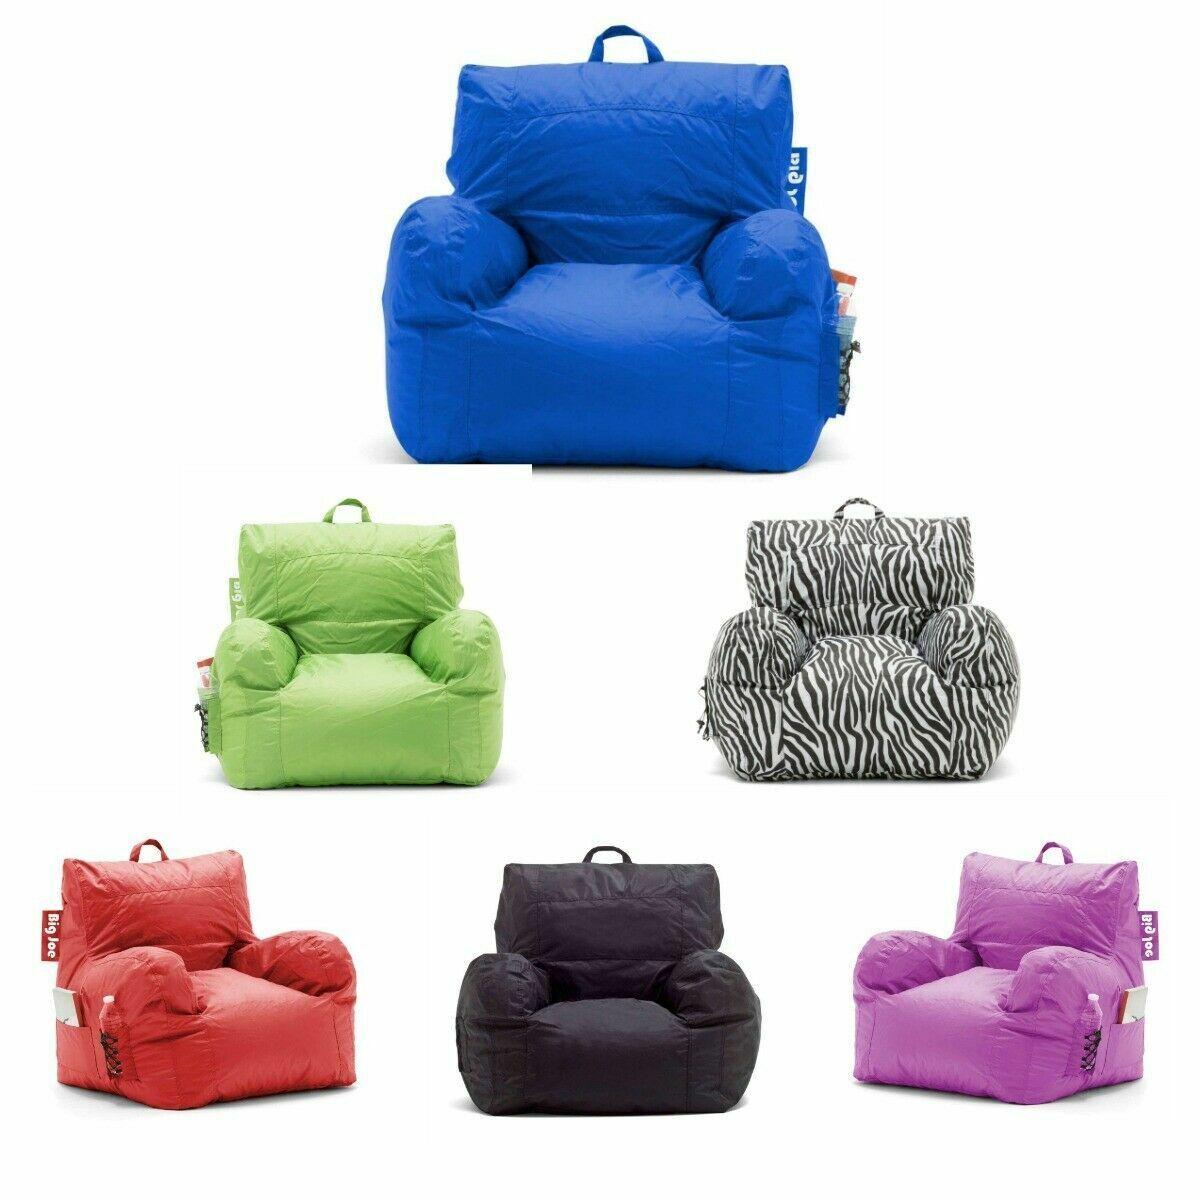 Big Joe Bean Bag Chair Comfort Dorm Cupholder Waterproof Sof